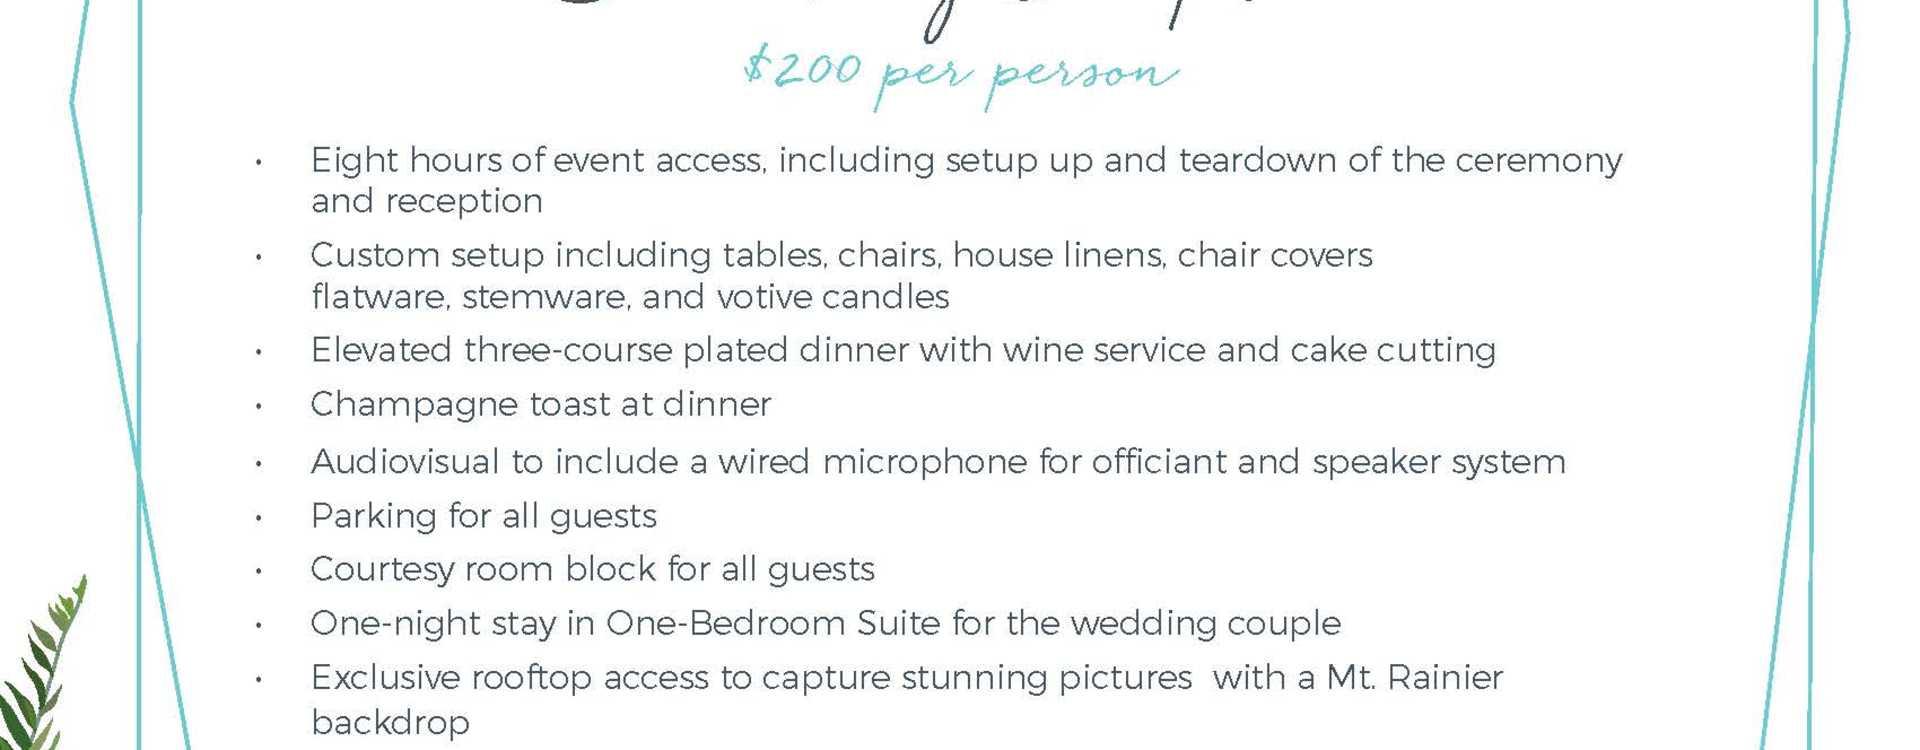 Hotel Interurban Celebrate Small Something Complete Wedding